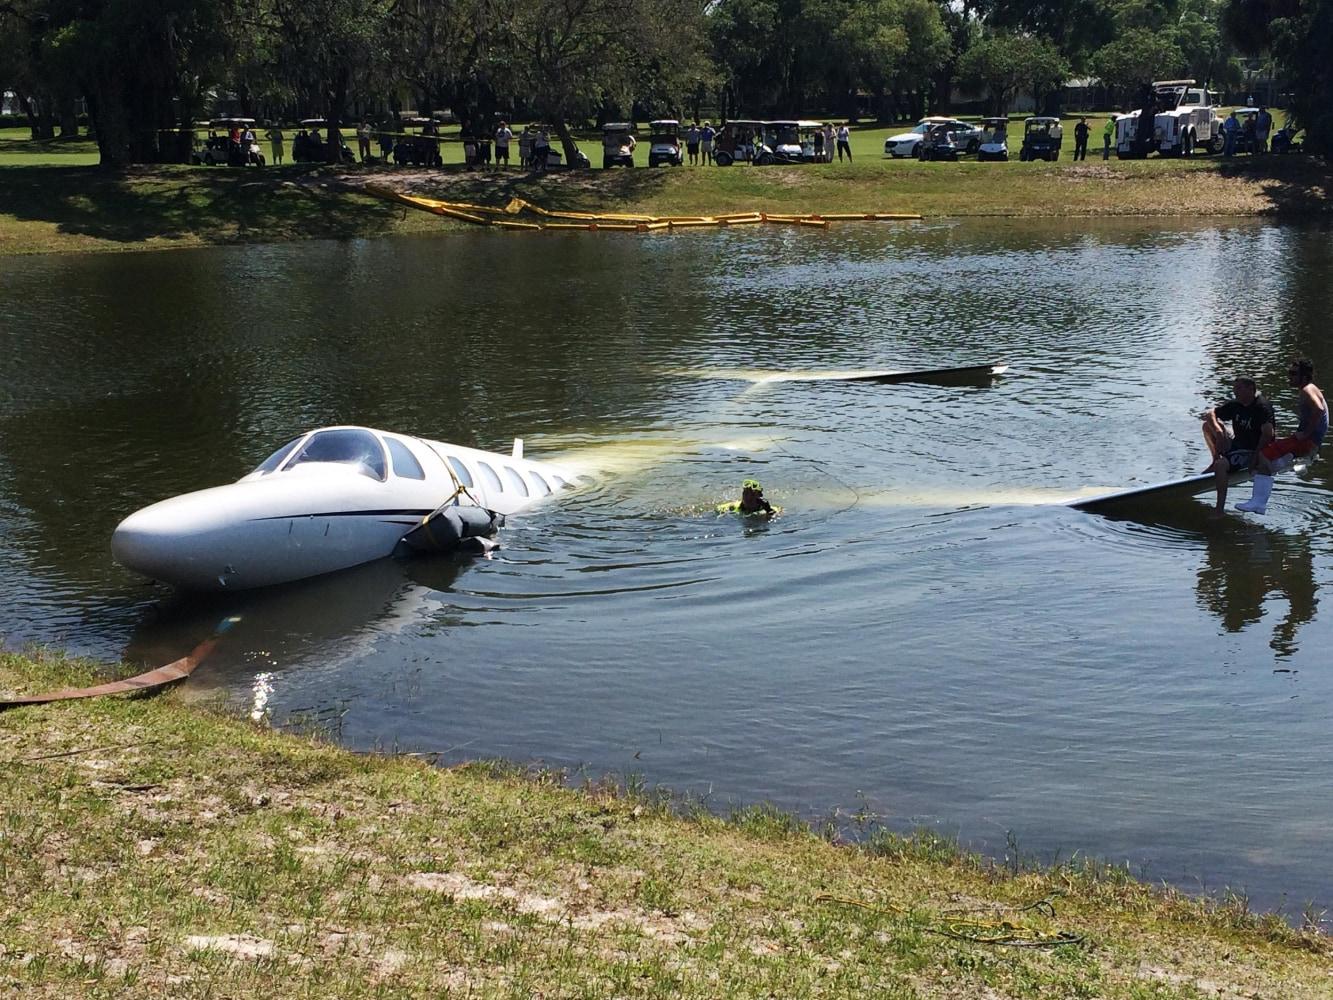 Jet Rolls Into Florida Pond - NBC News